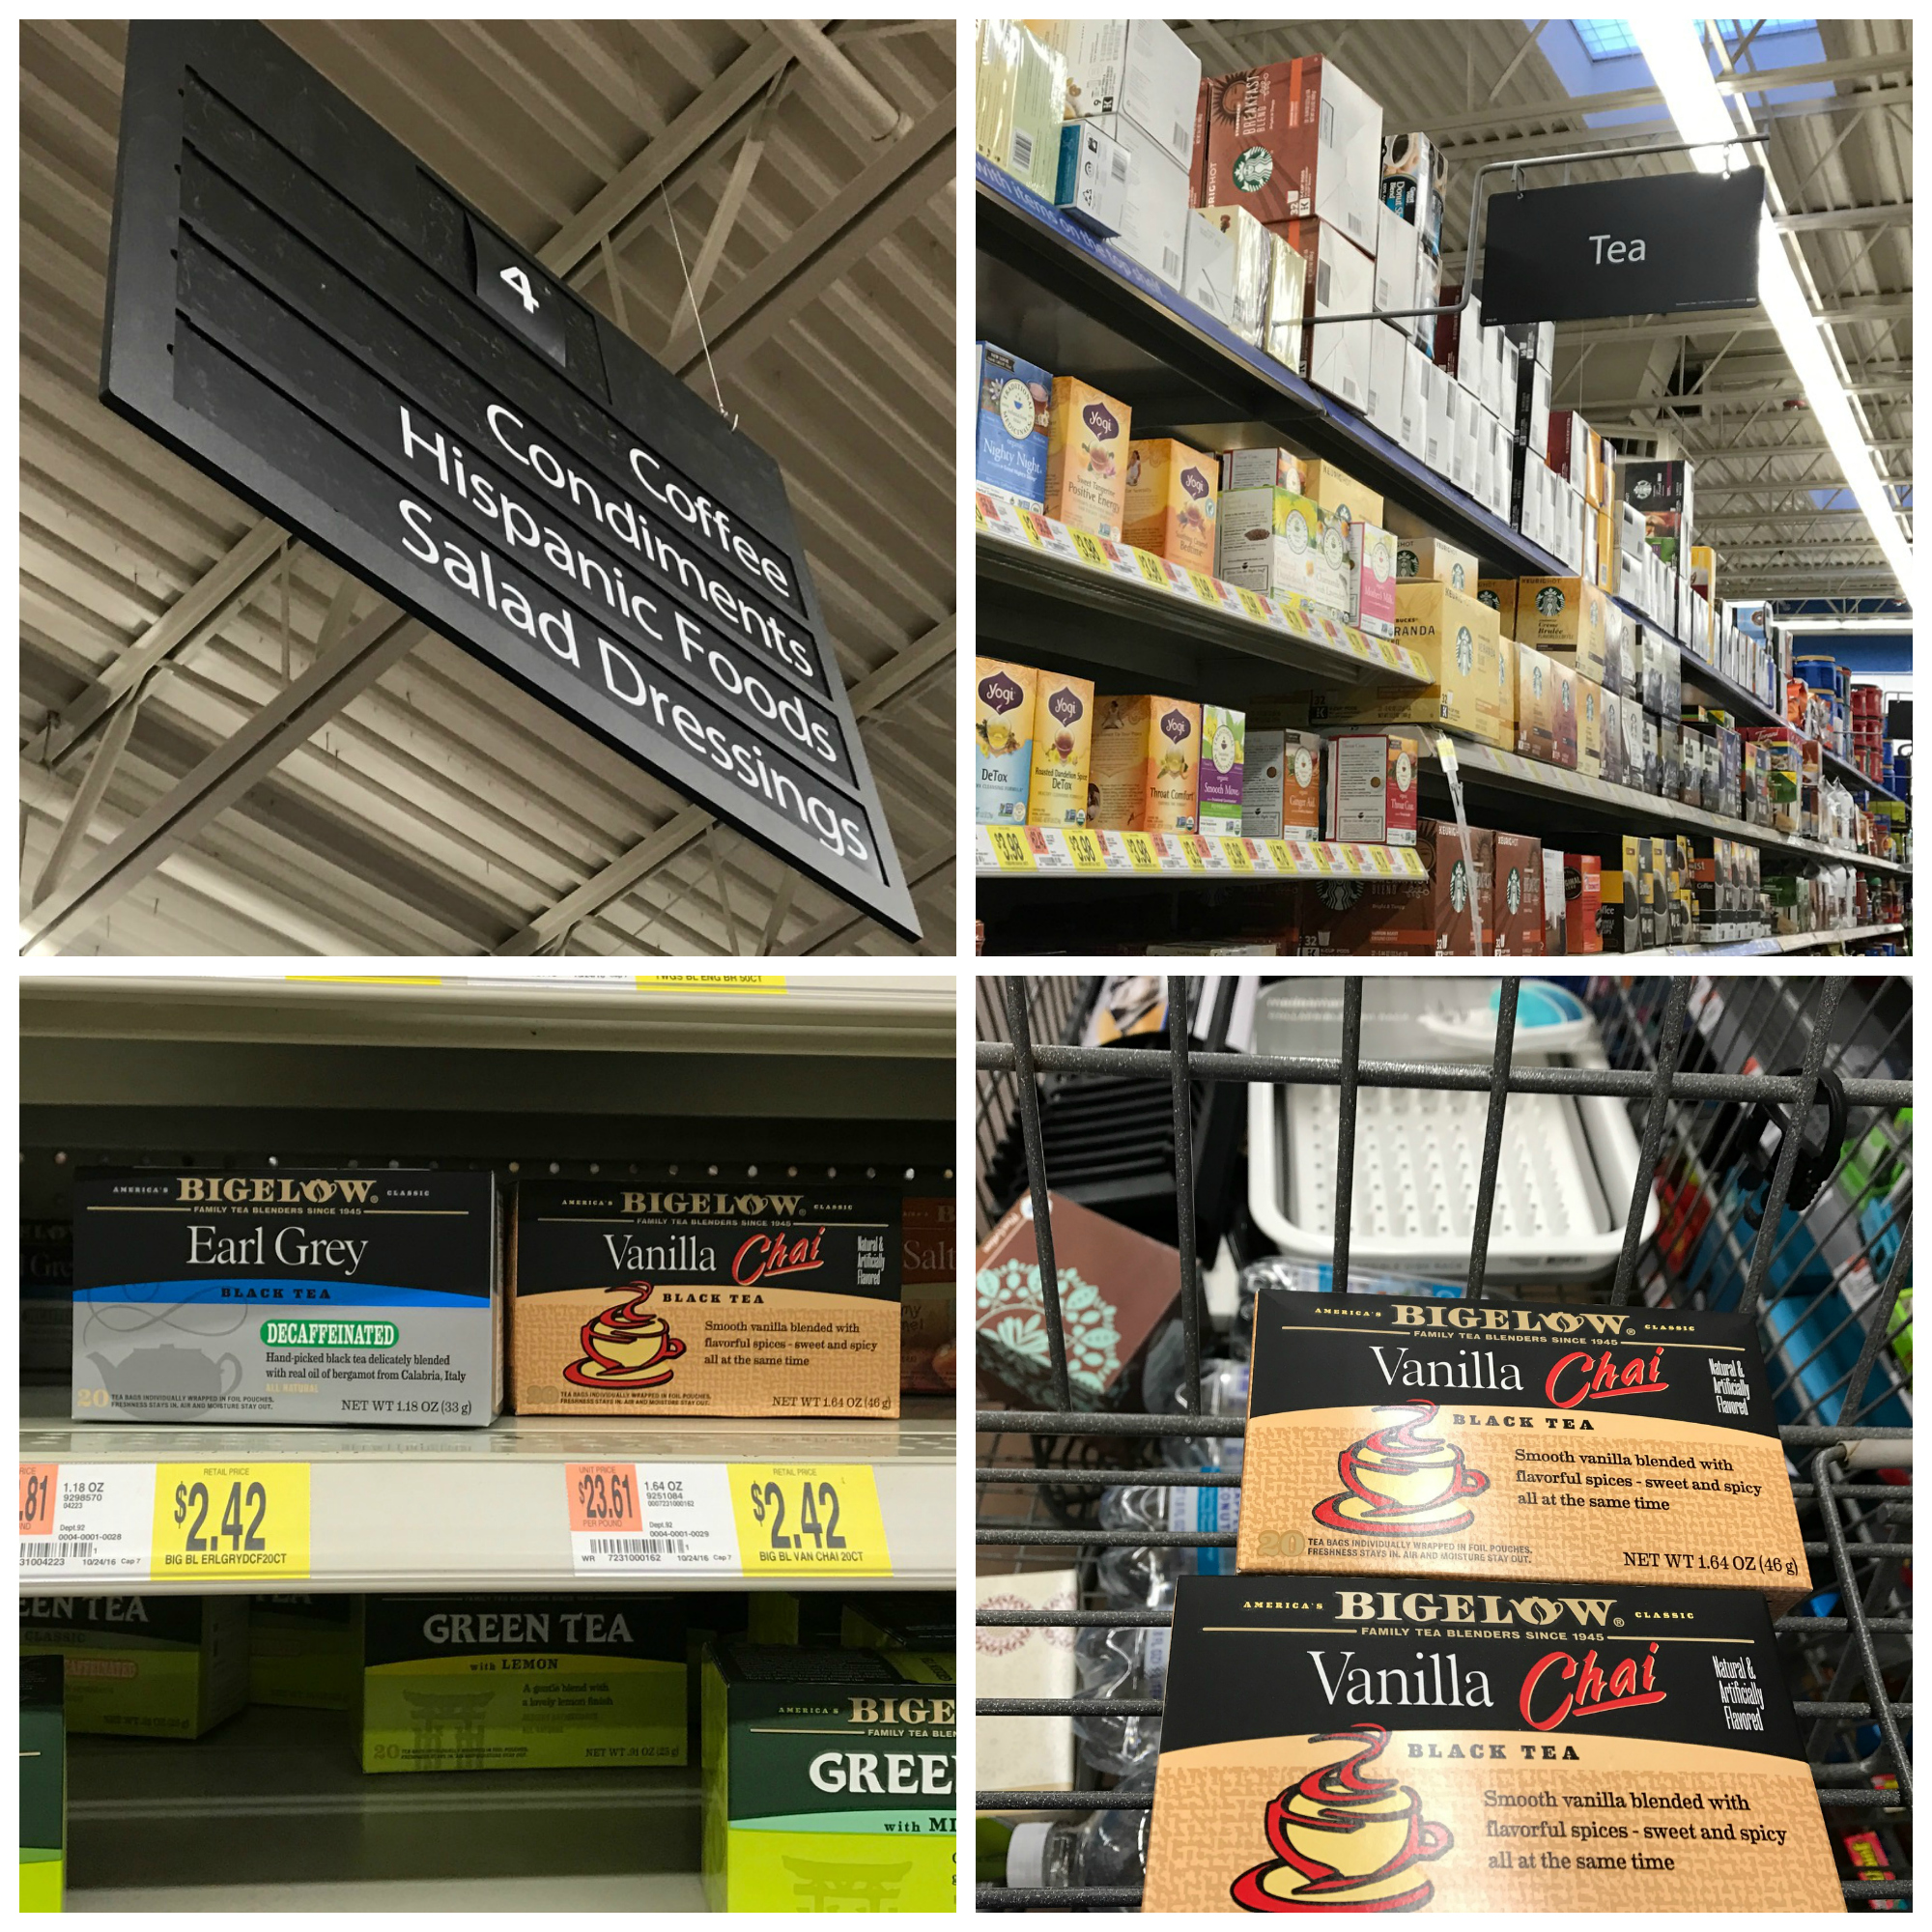 Bigelow Tea at Walmart Product Shot